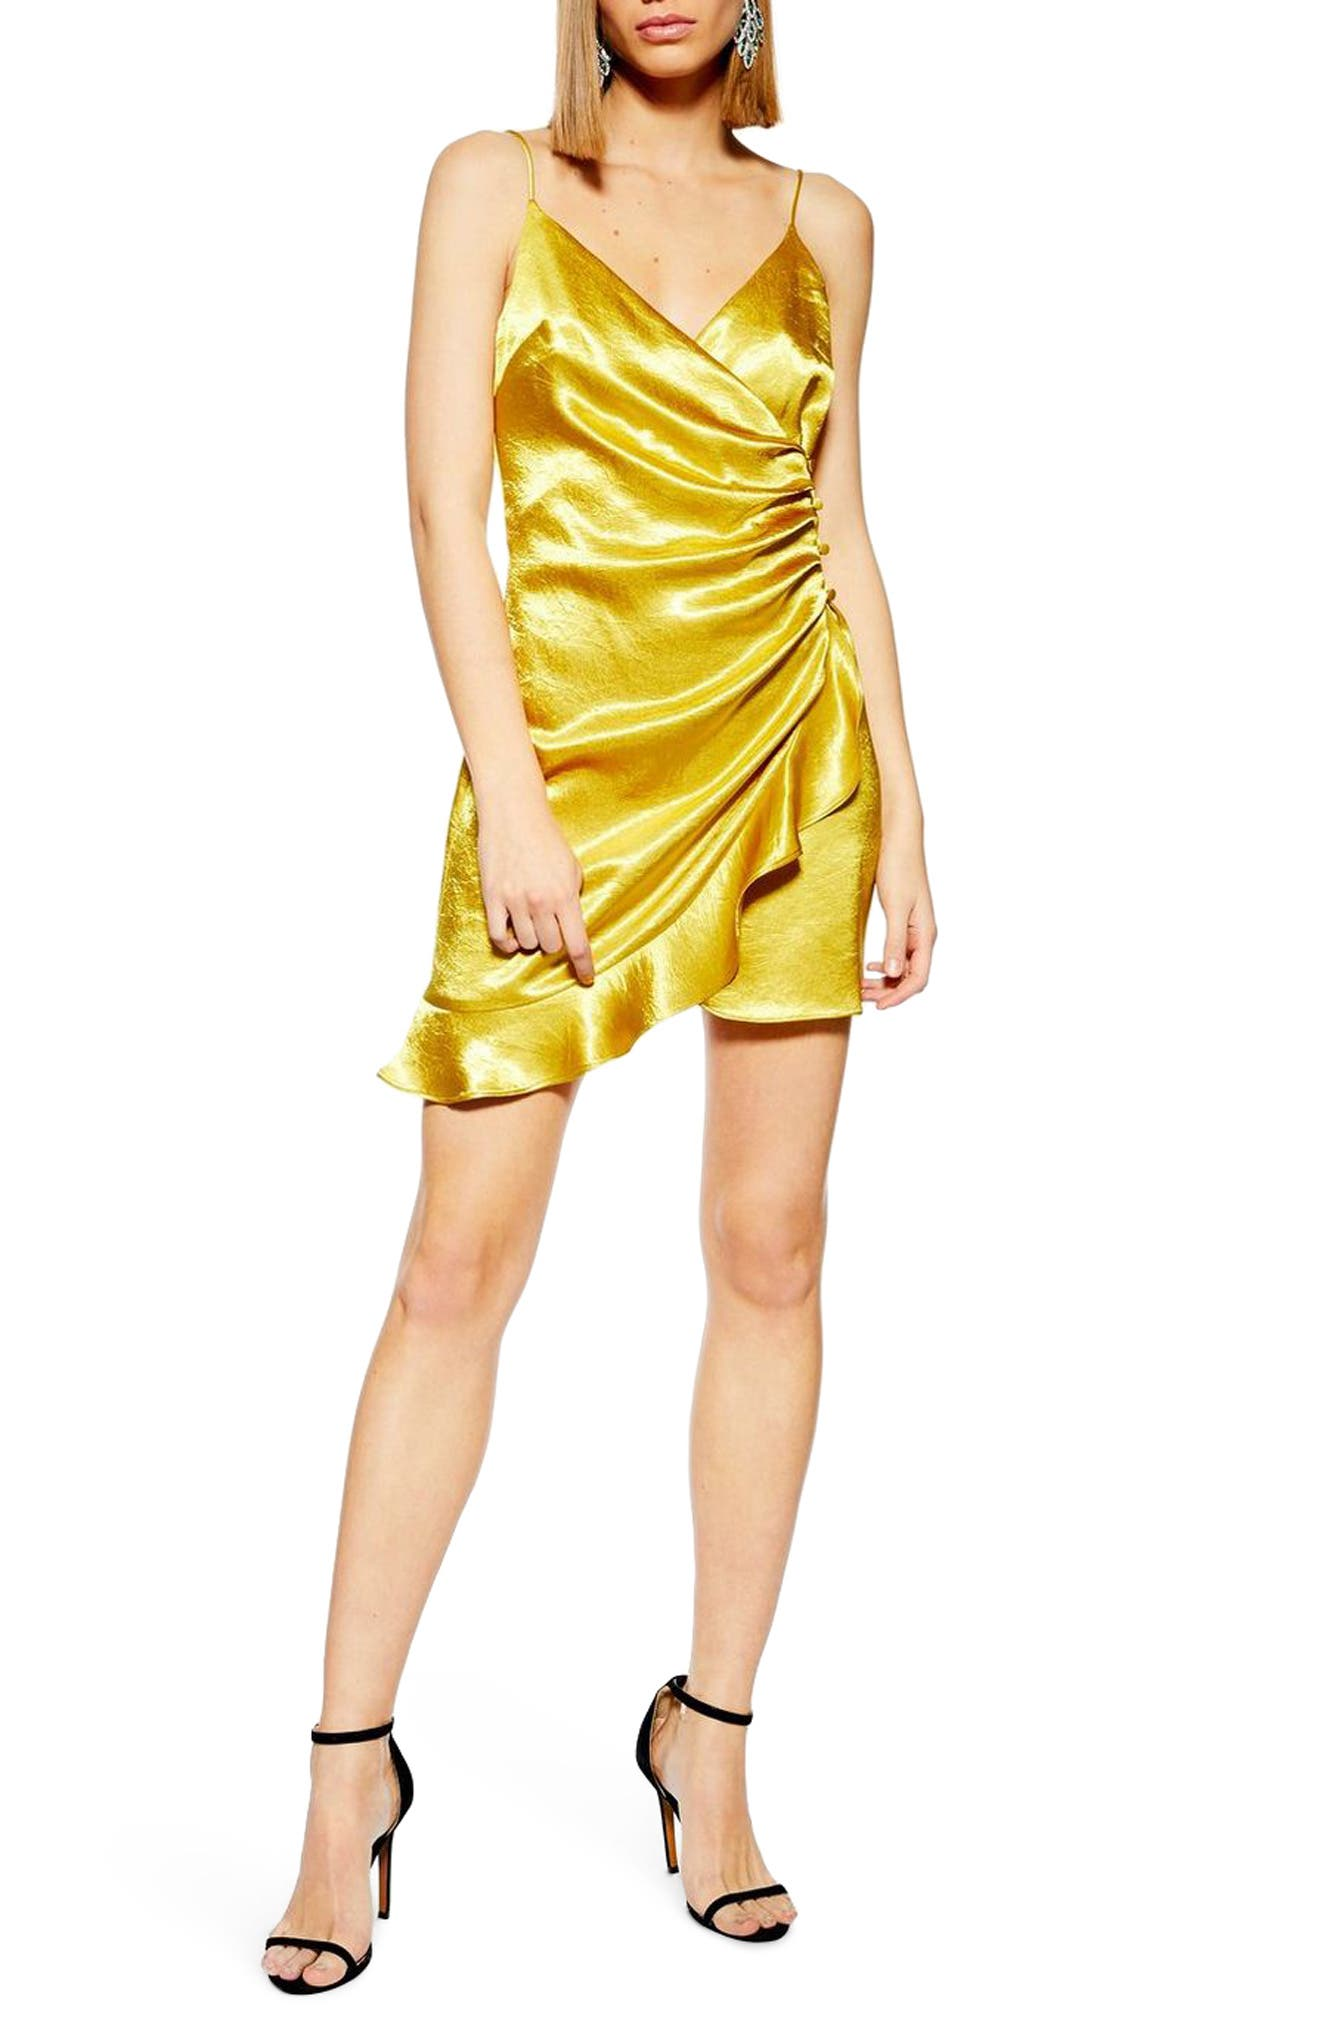 Topshop Ruched Satin Minidress, US (fits like 0-2) - Yellow